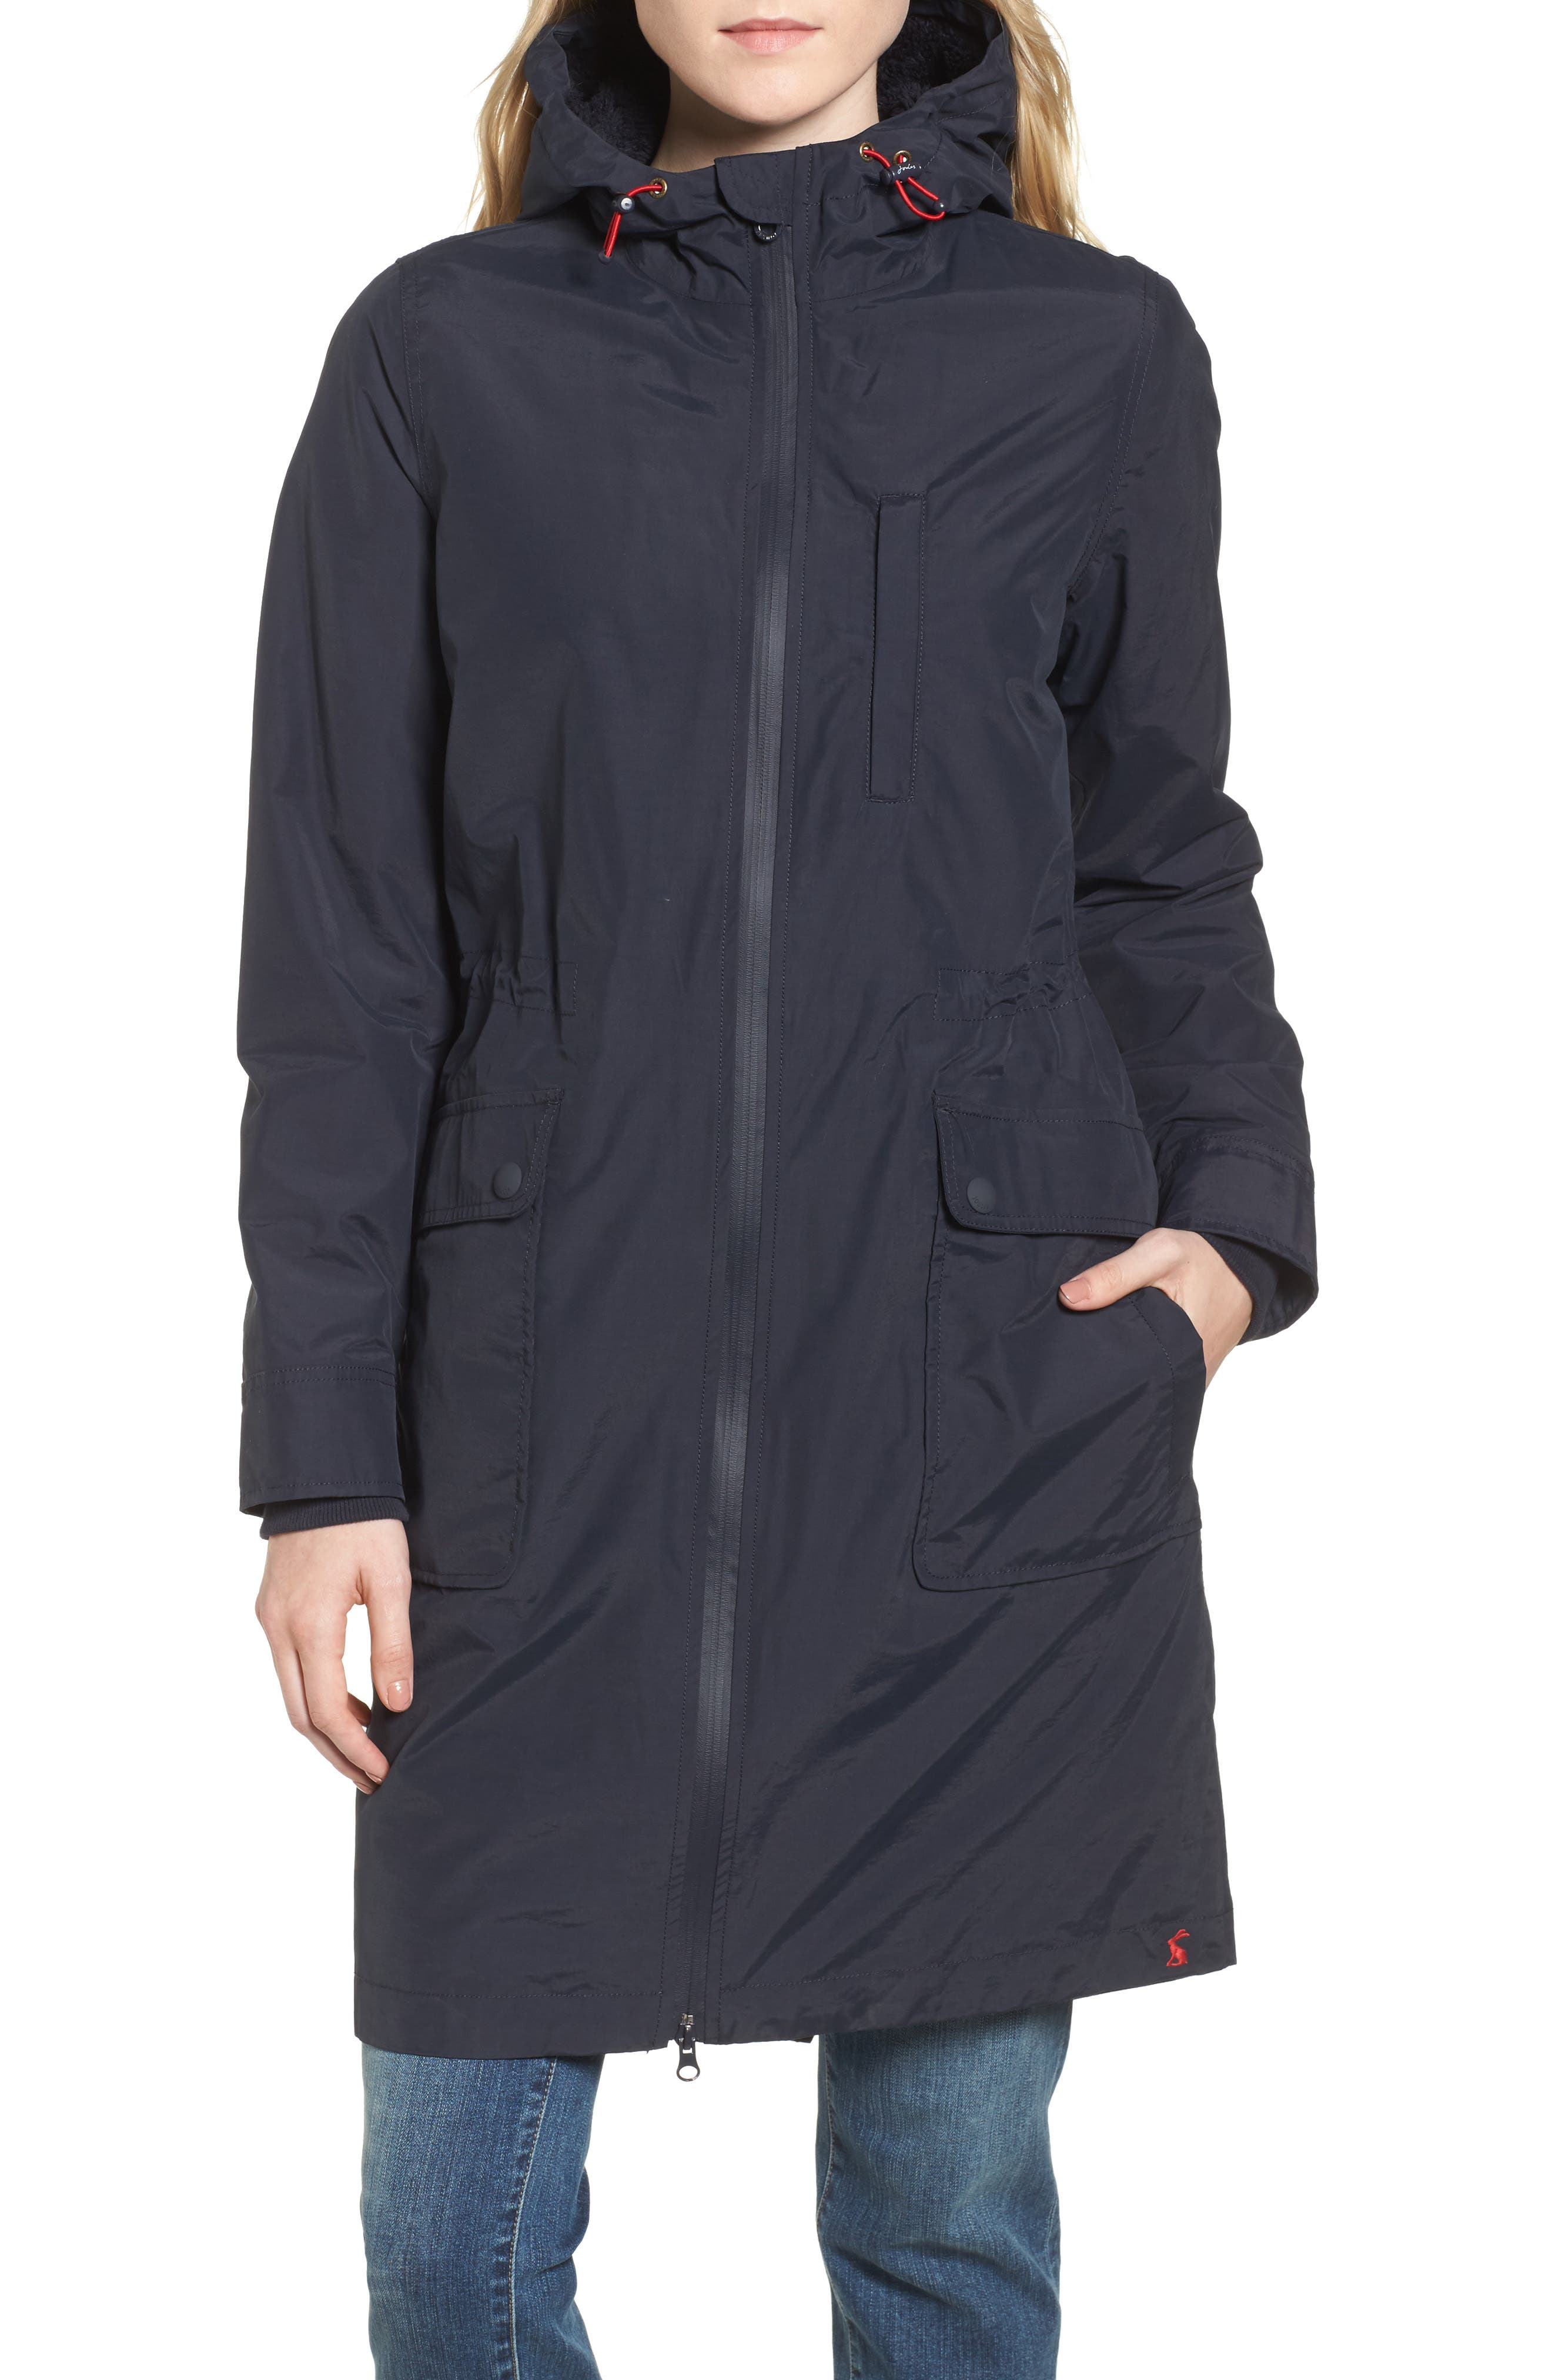 Hooded Fleece Lined Raincoat,                             Alternate thumbnail 4, color,                             Marine Navy